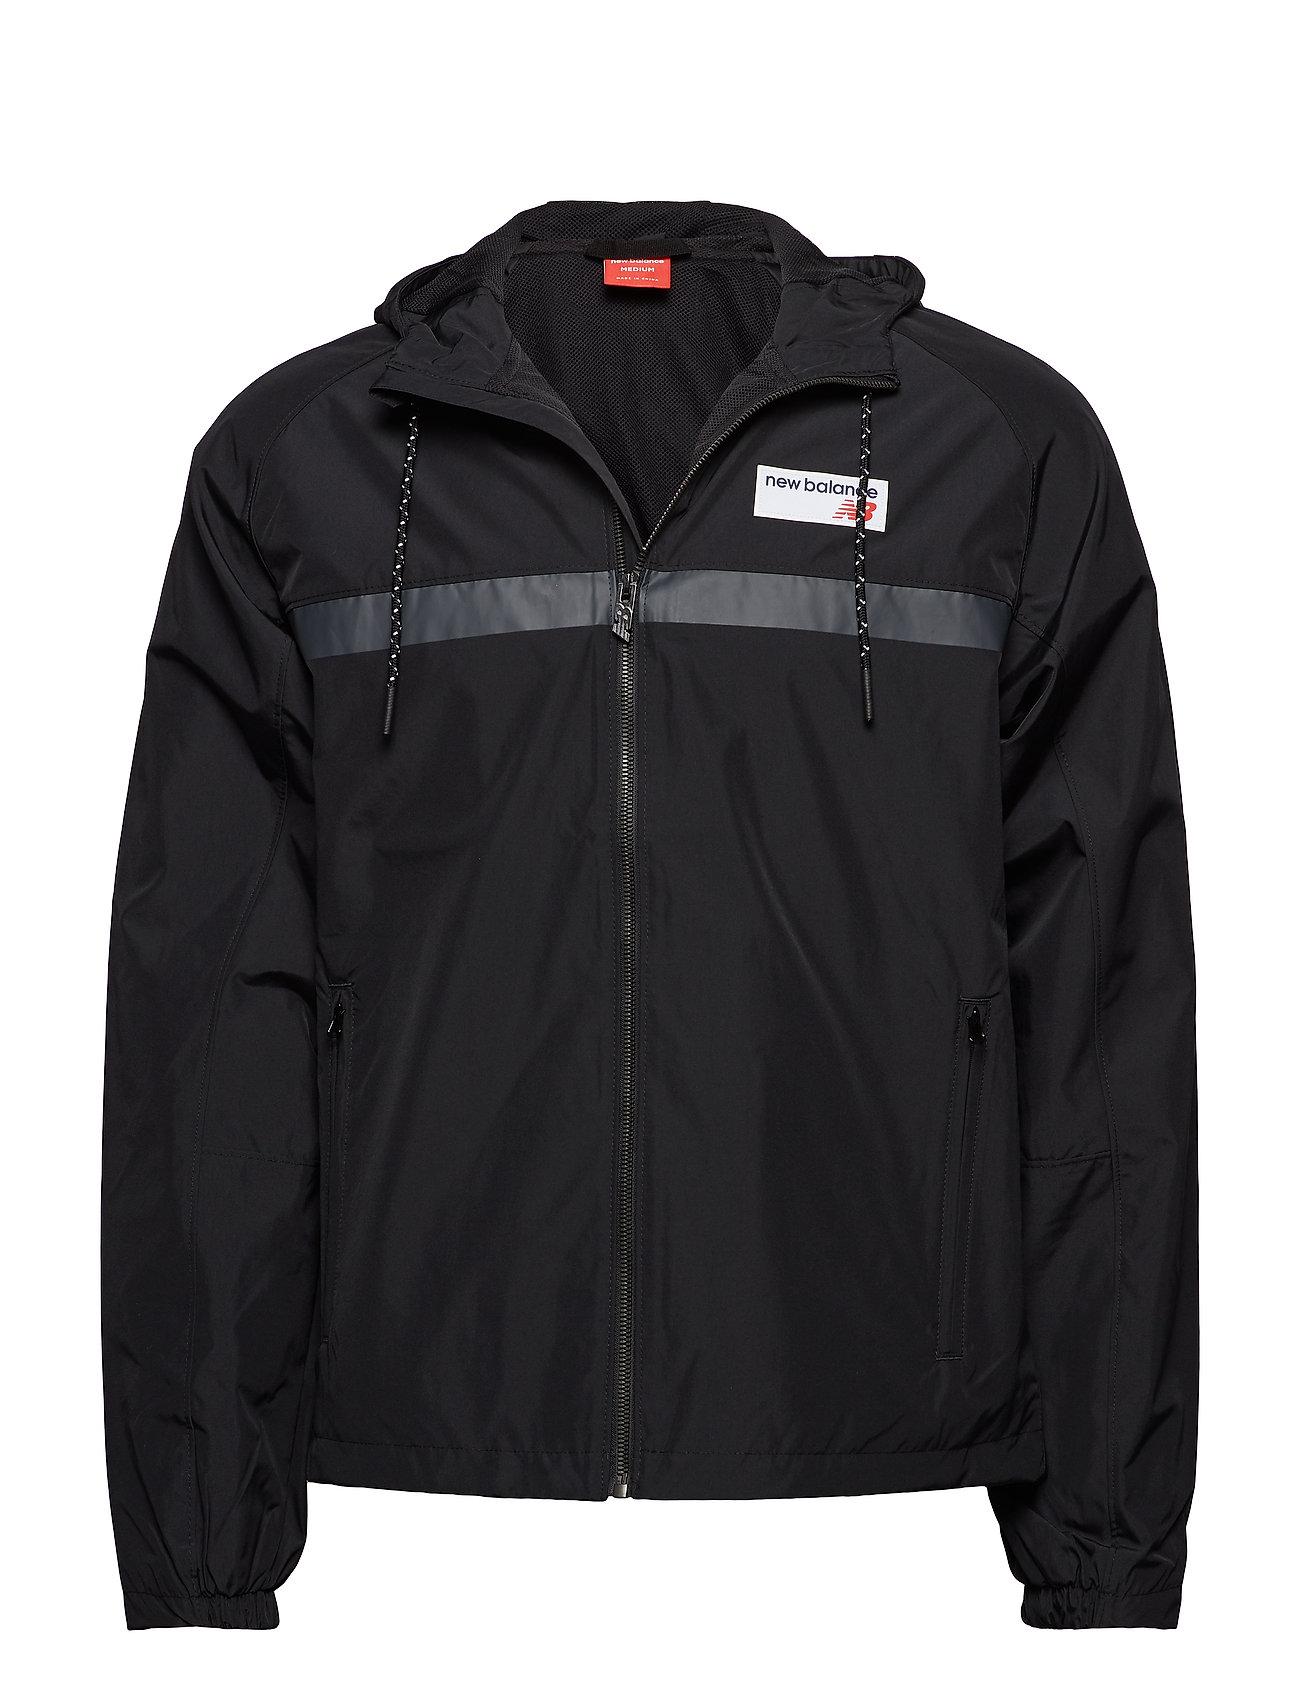 b18ce6529 Nb Athletics 78 Jacket (Black) (65 €) - New Balance - | Boozt.com